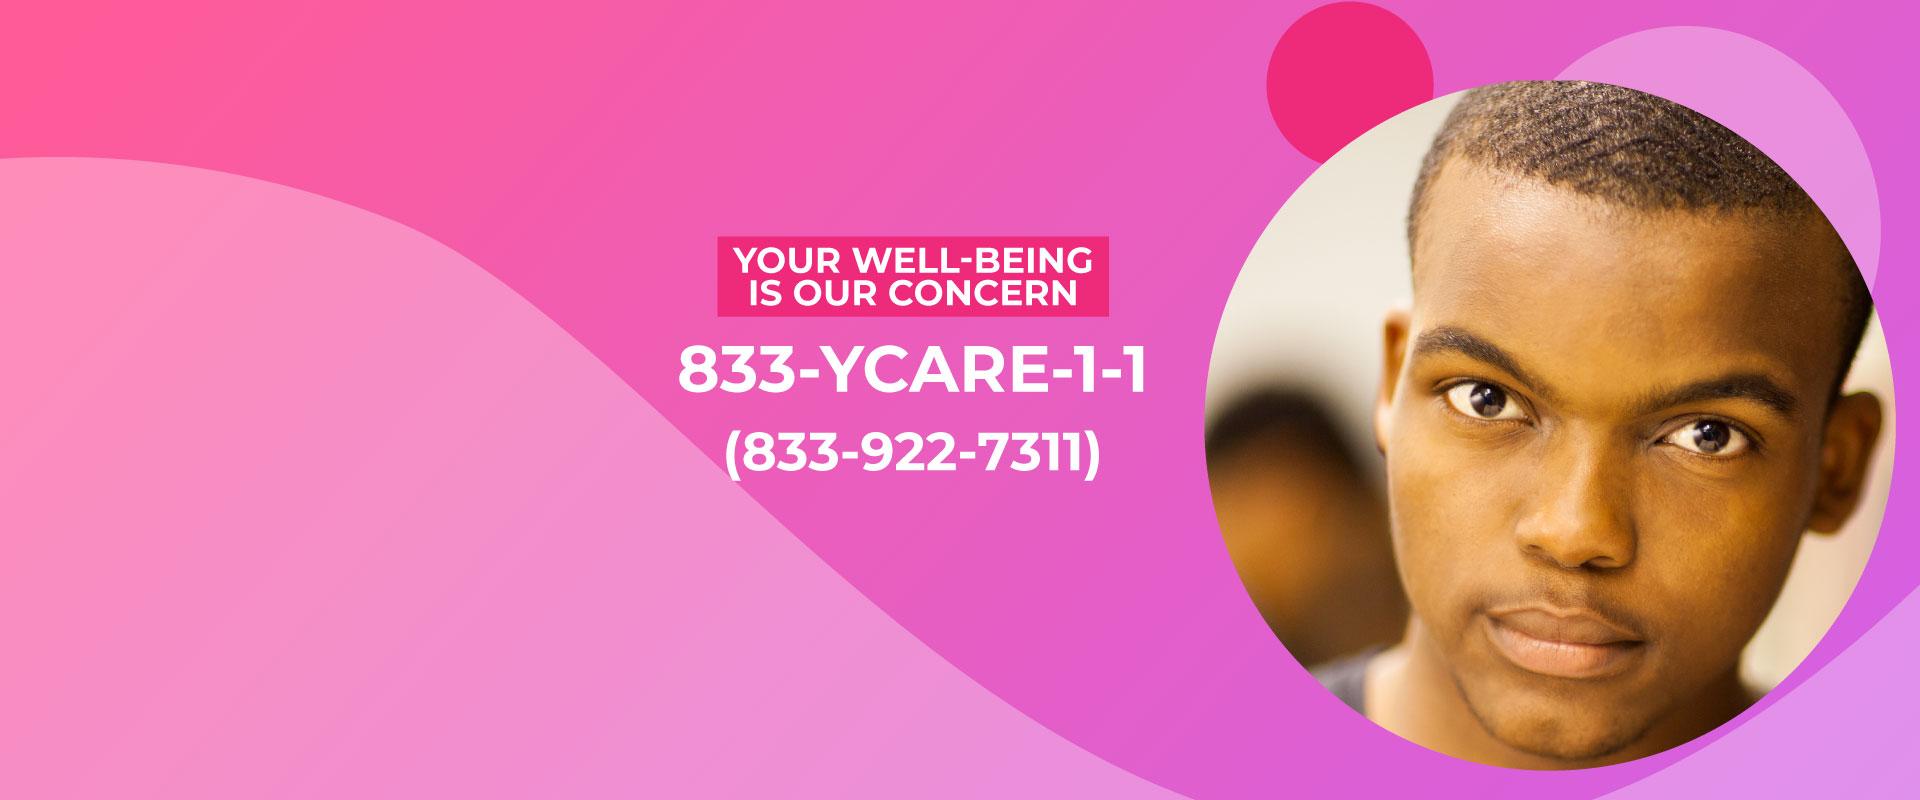 Call 833-YCARE-1-1